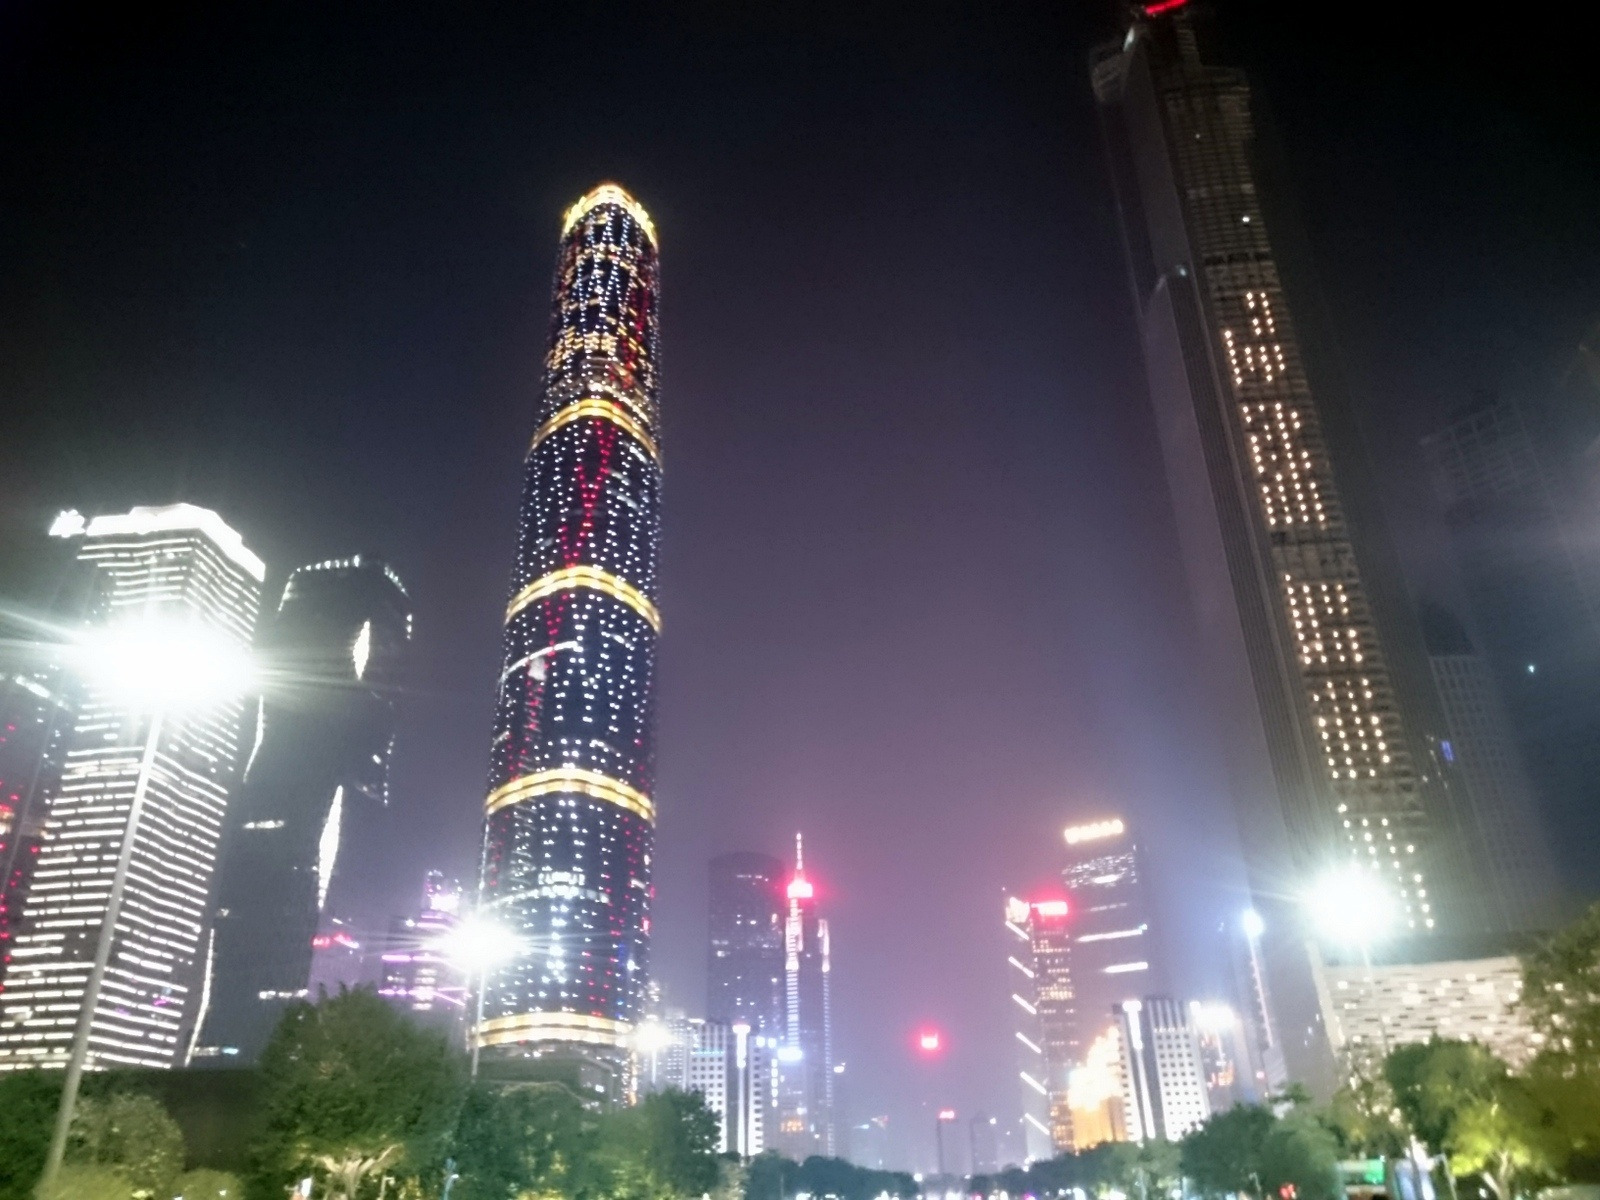 Китай. Завод устройств для «Умного дома». Учимся и учим - 3